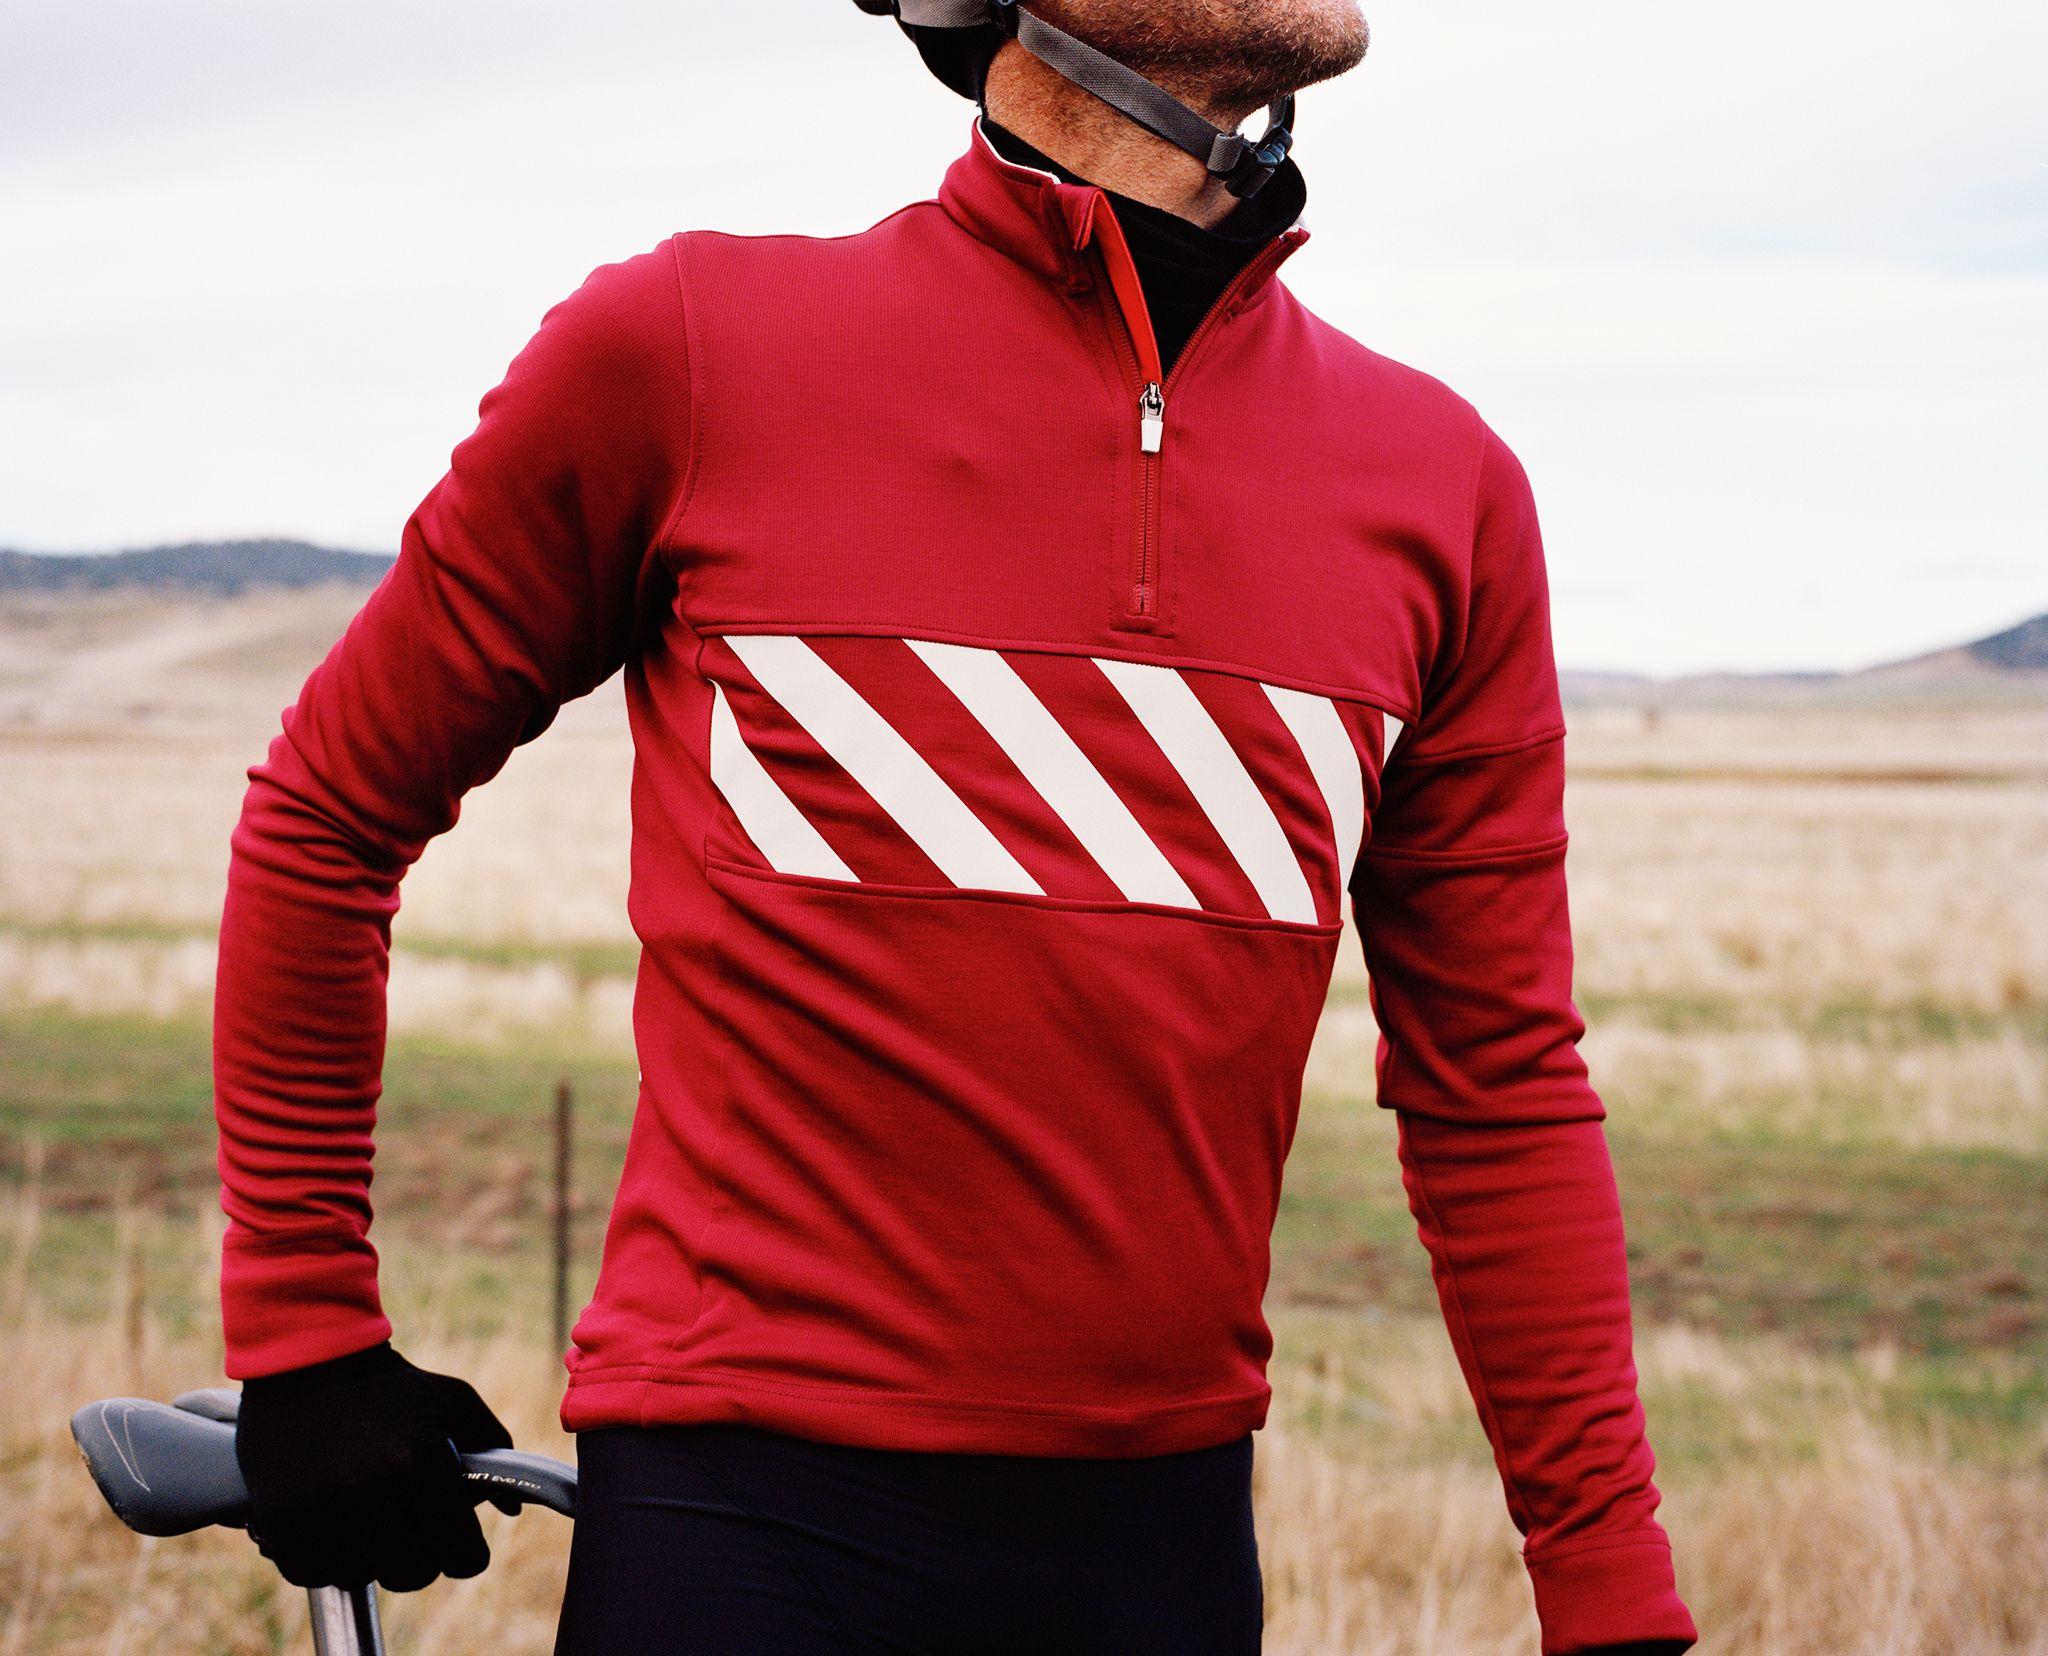 Rapha x Davis Phinney   Connie Carpenter Cycling Wear e0c332edf